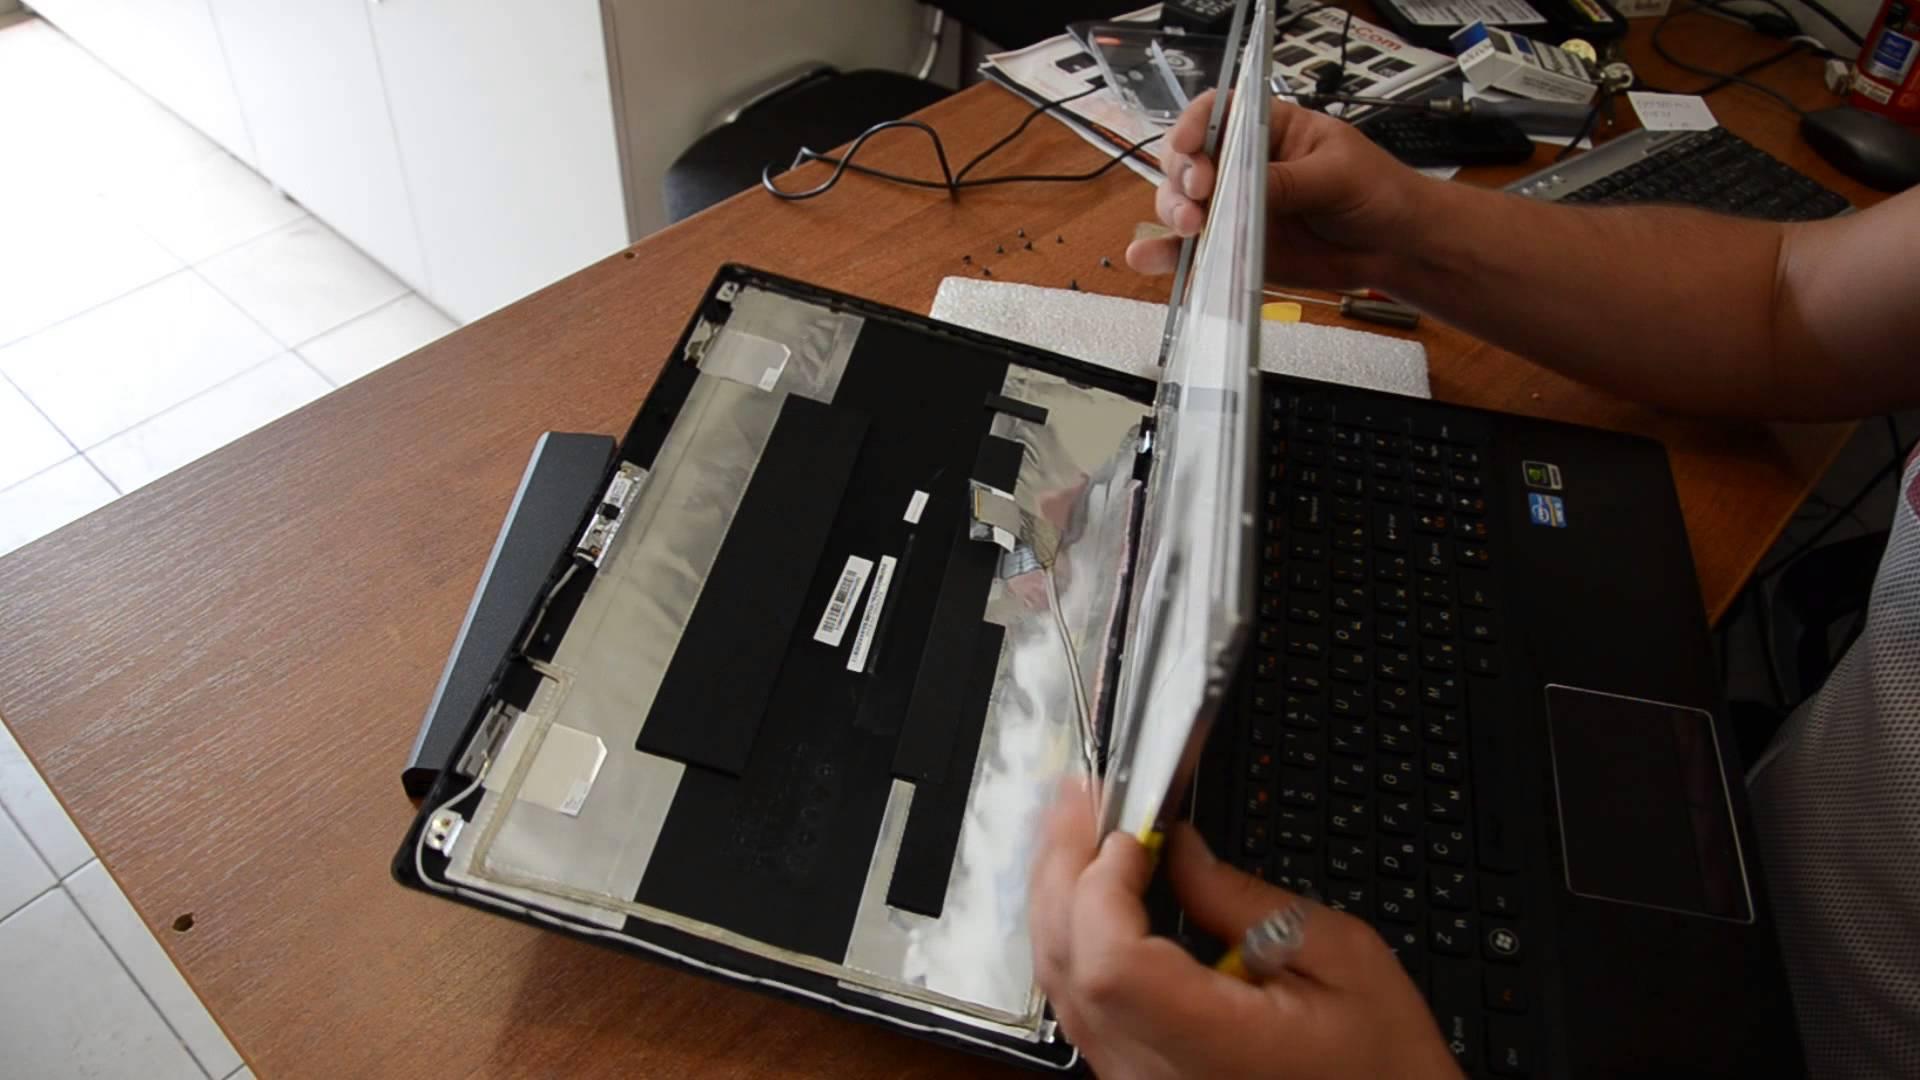 Замена матрицы экрана ноутбука своими руками